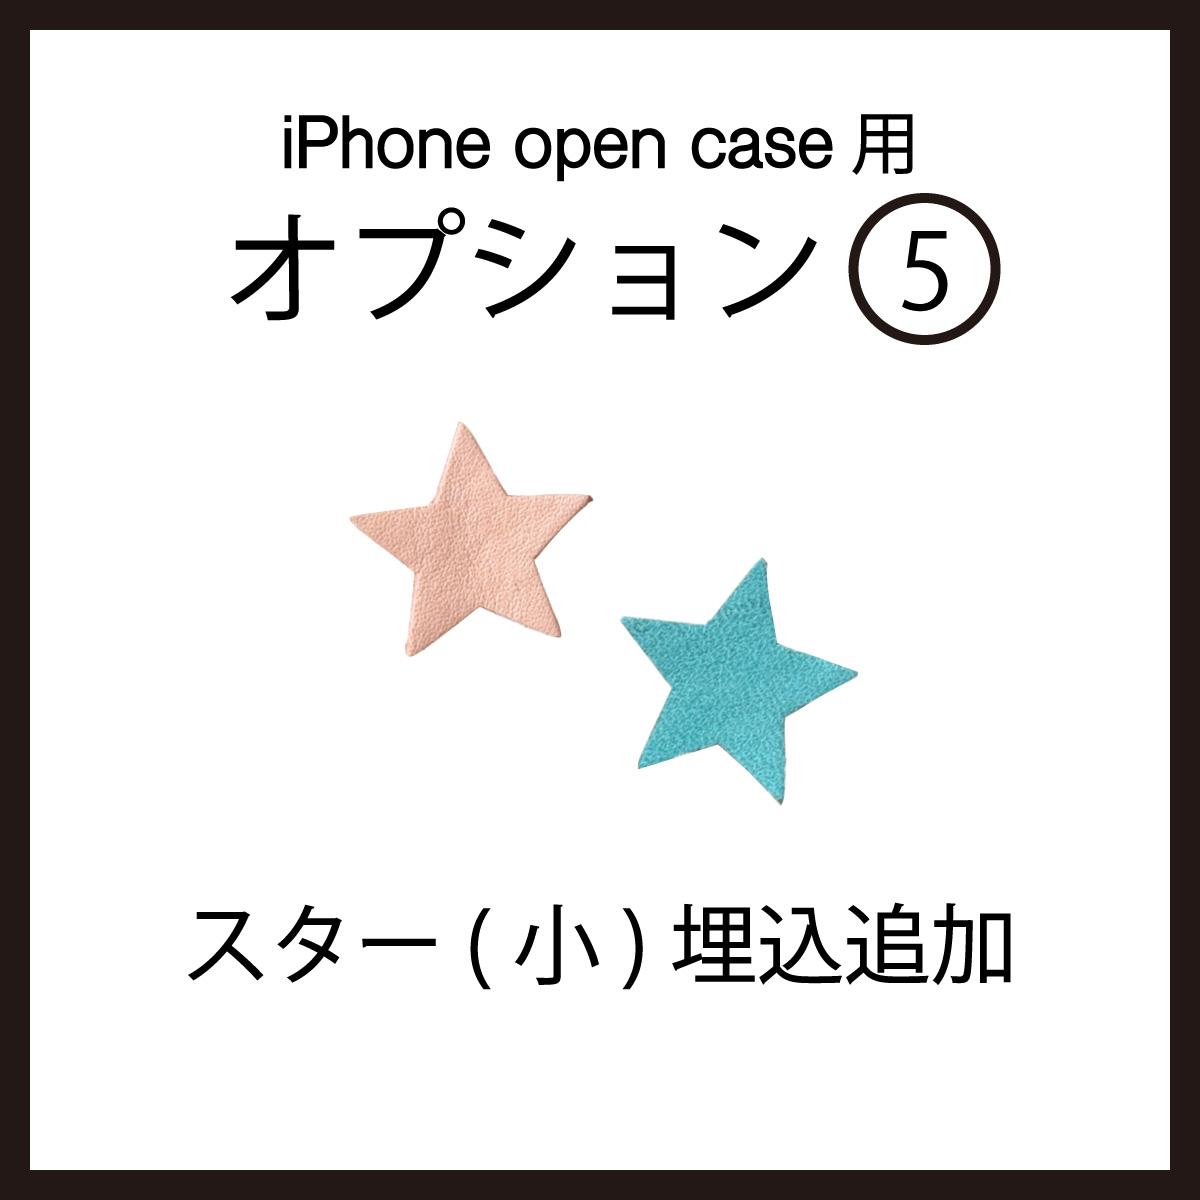 iPhoneOpenCase:    Option5:スター(小)埋込追加